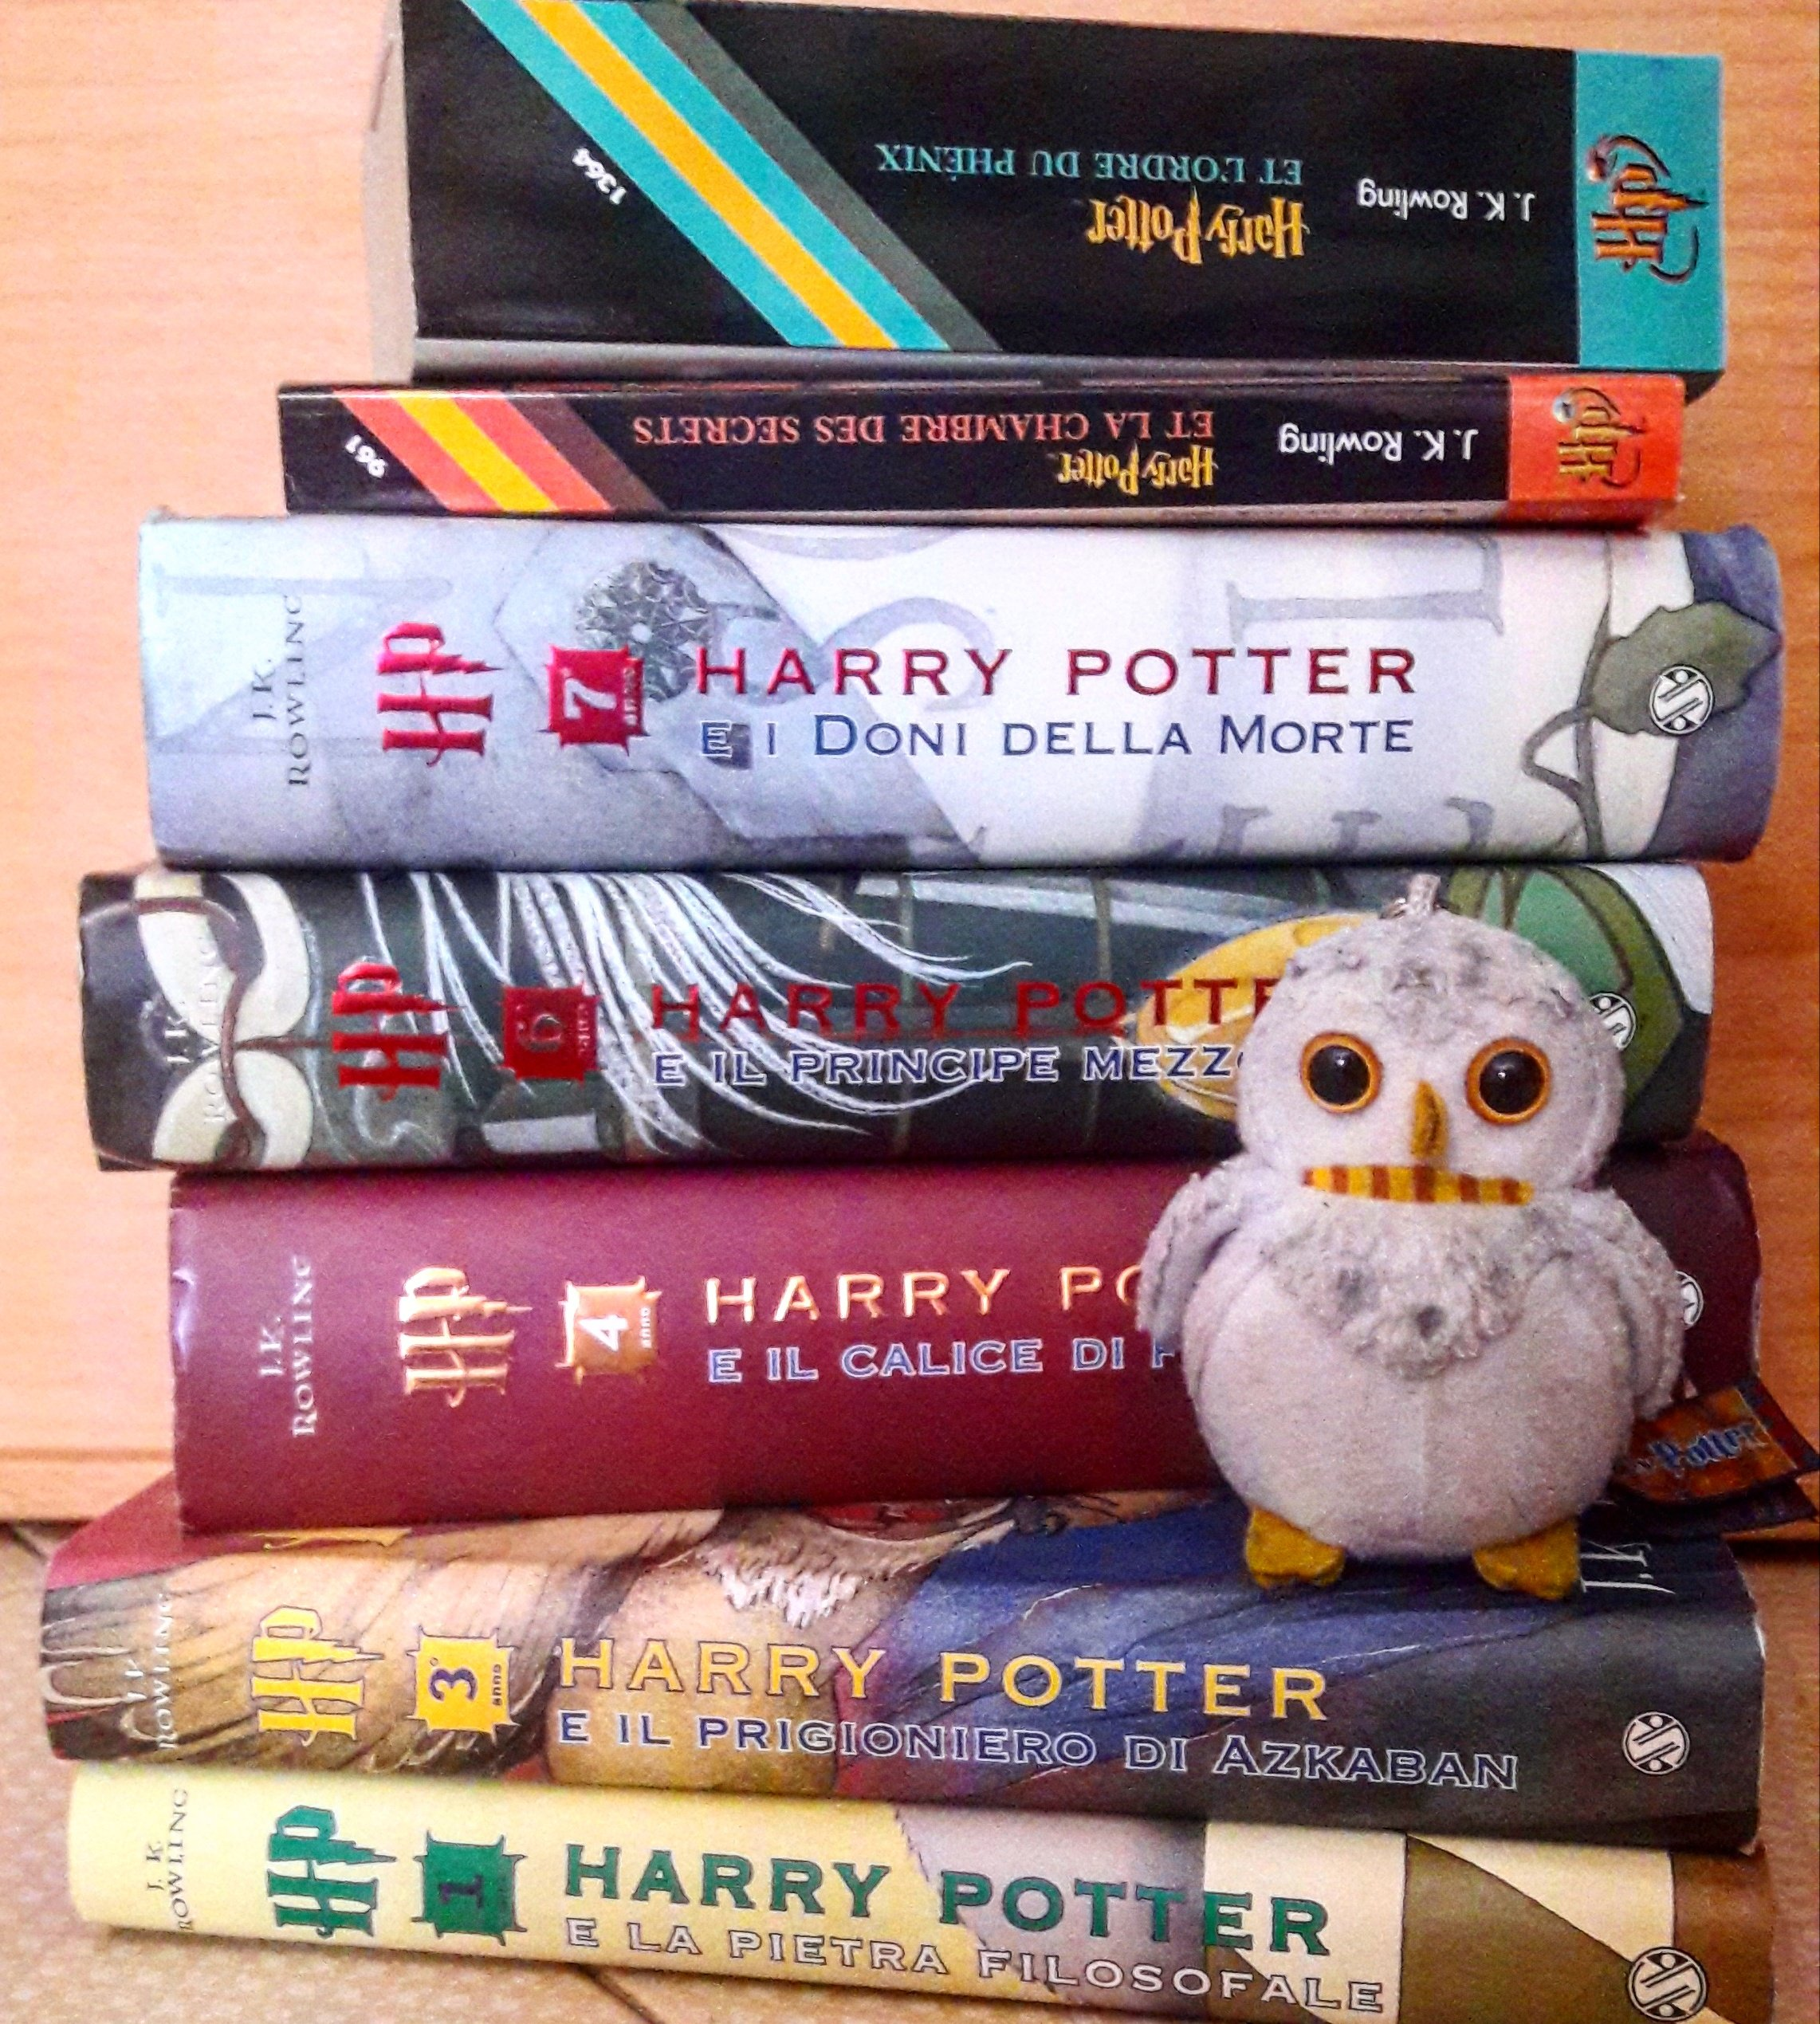 Harry Potter, J. K. Rowling